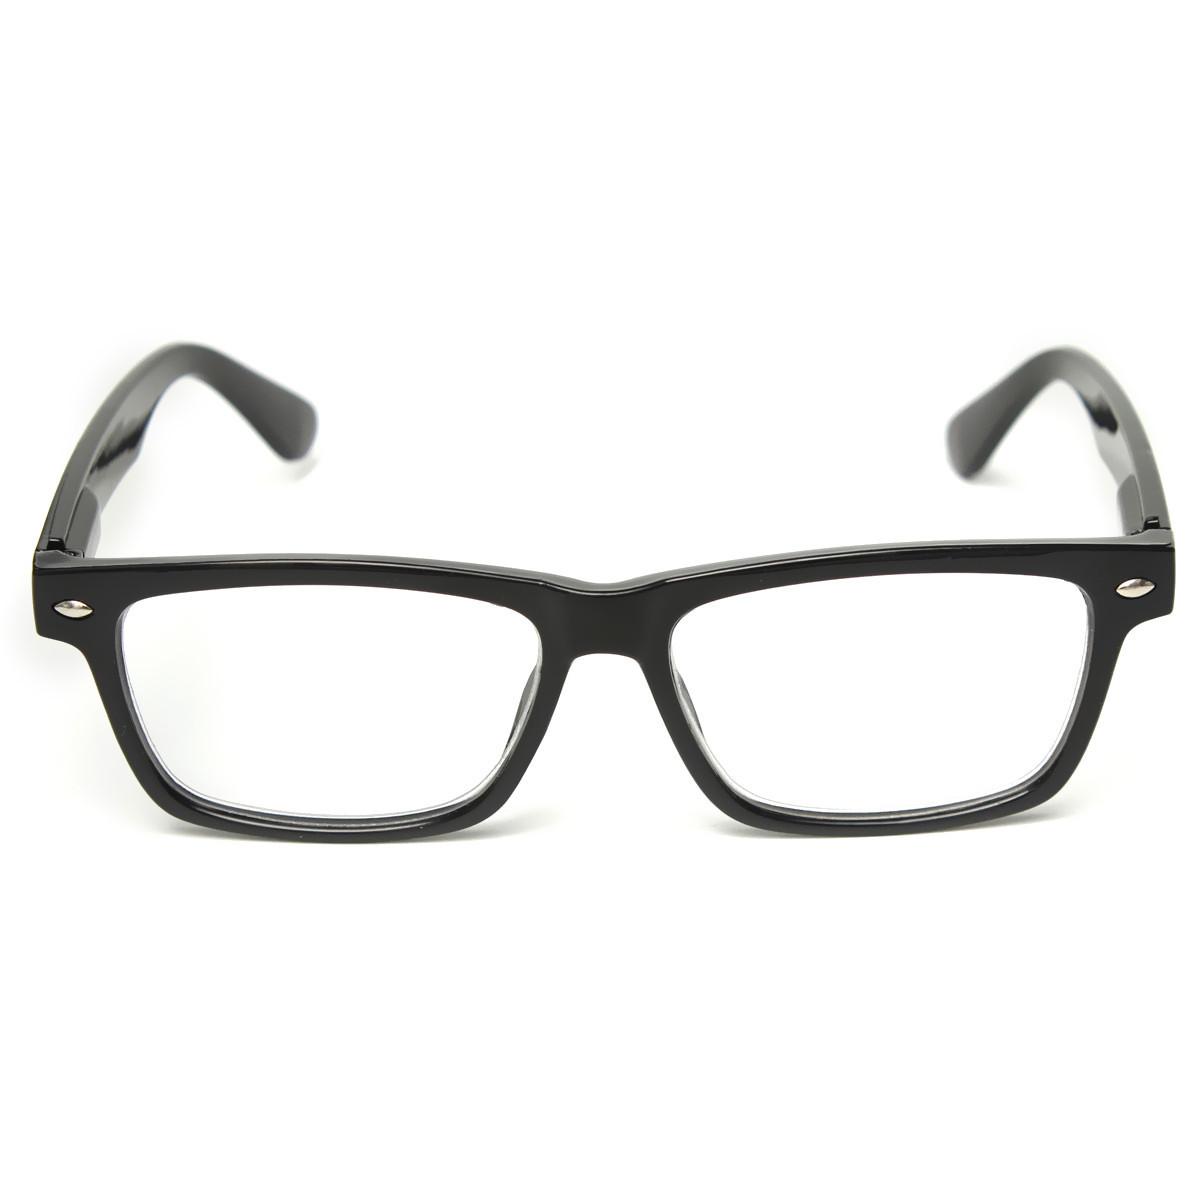 Black Light Comfortable Presbyopic Border Reading Glasses Strength 1.0 1.5 2.0 2.5 3.0 3.5 4.0